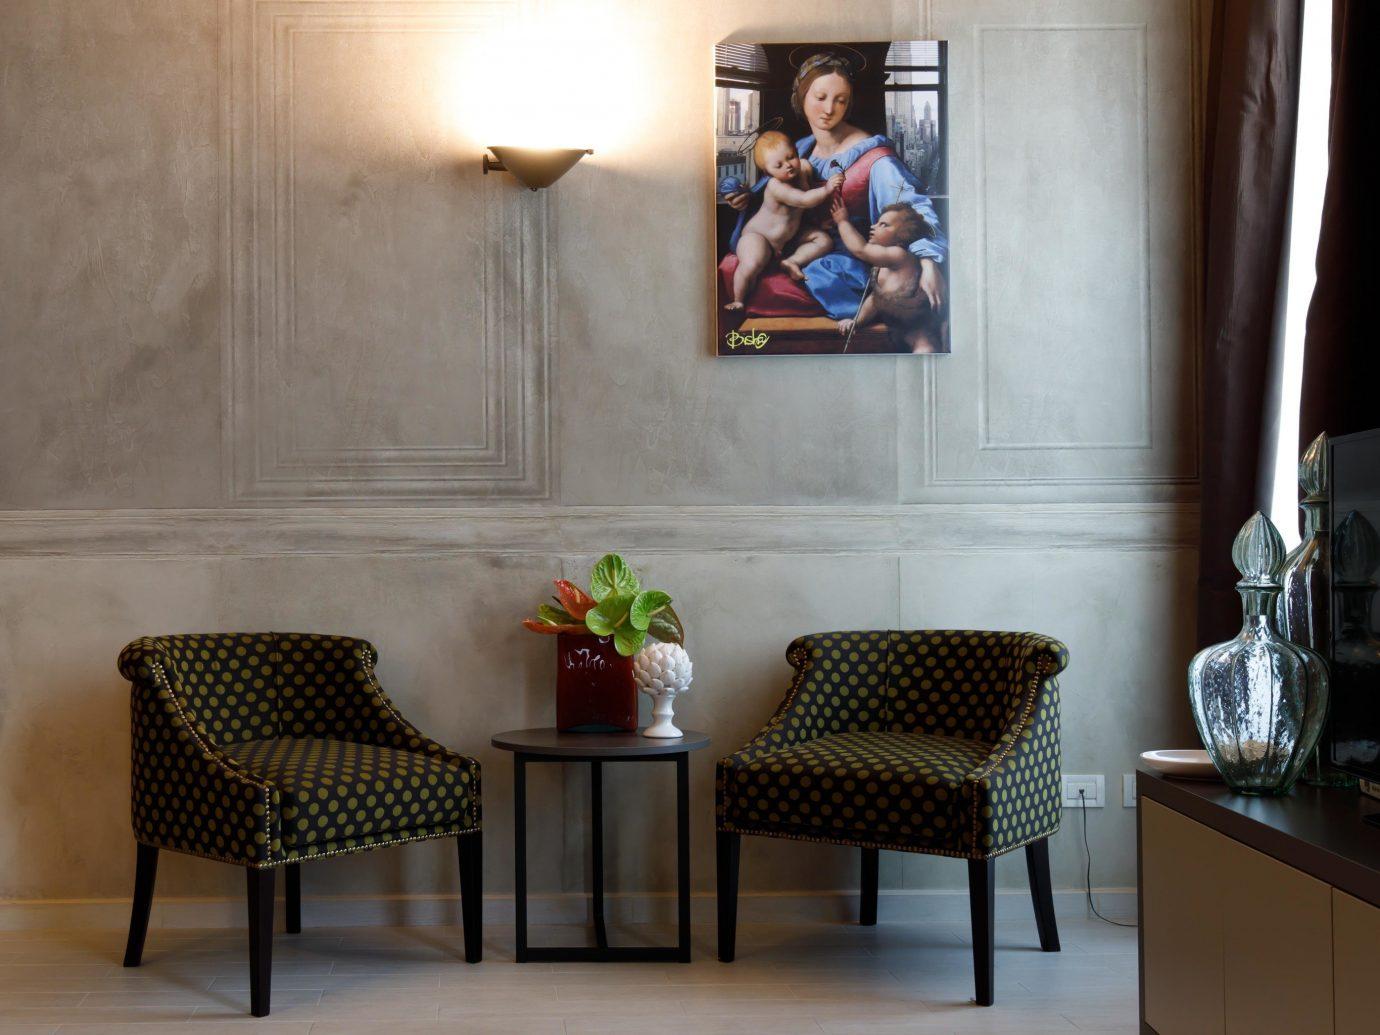 Hotels Italy Milan floor wall indoor room furniture interior design table Living chair living room home couch window flooring Bedroom area lamp